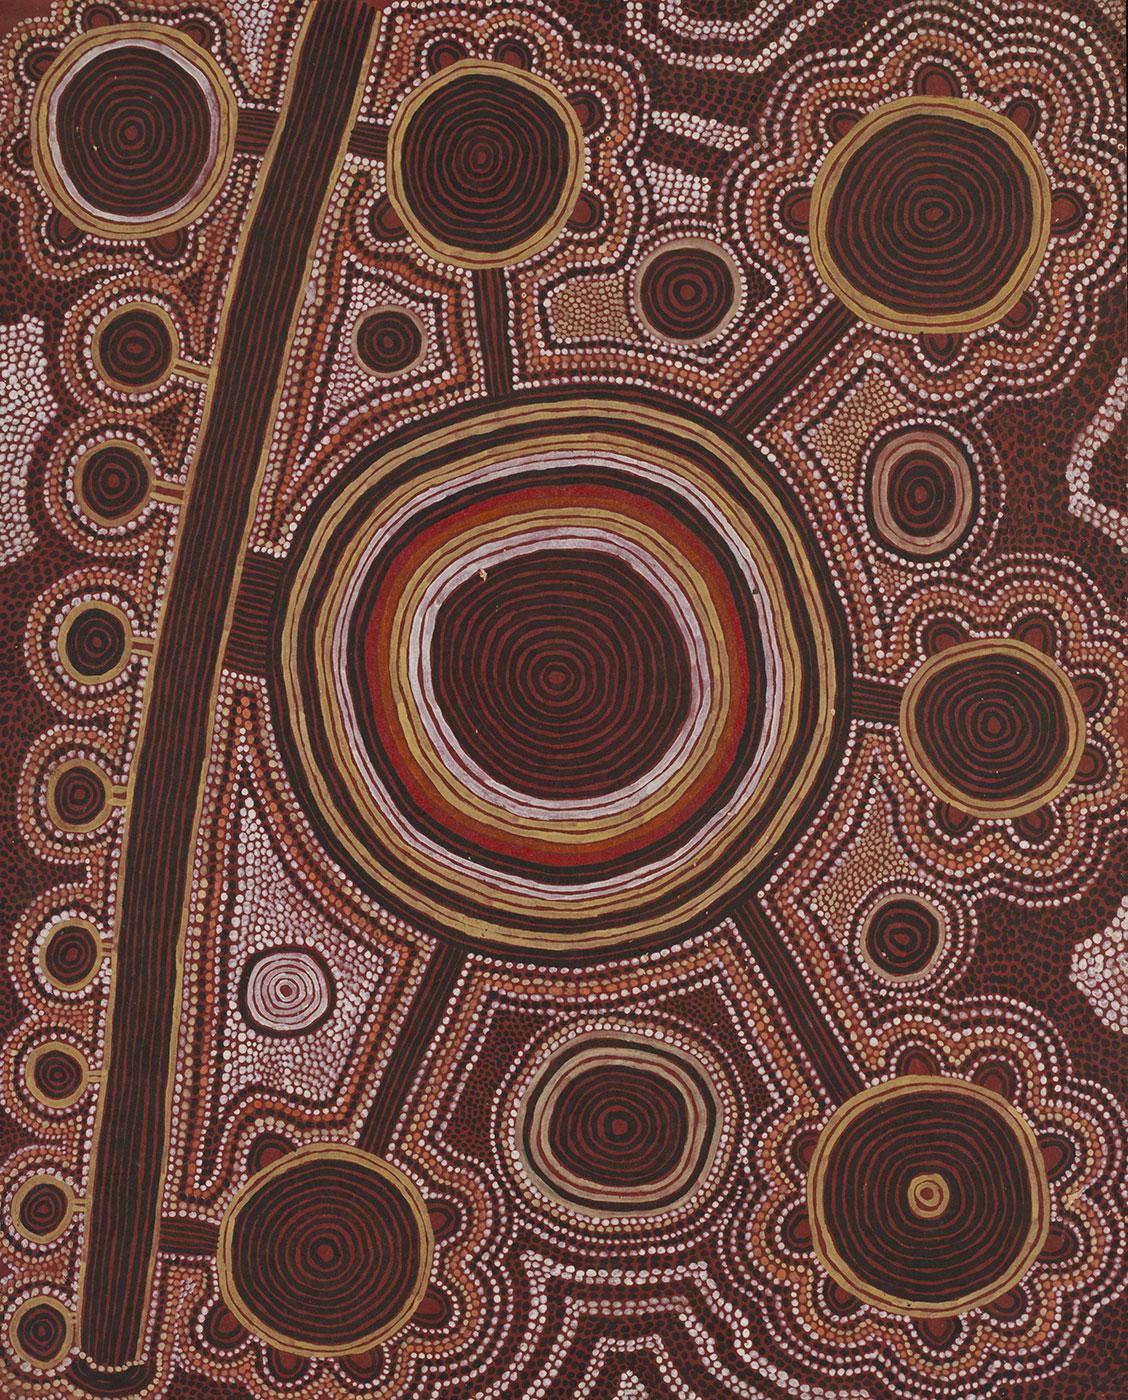 Ngurrapalangu 1974 by Uta Uta (Wuta Wuta) Tjangala. - click to view larger image